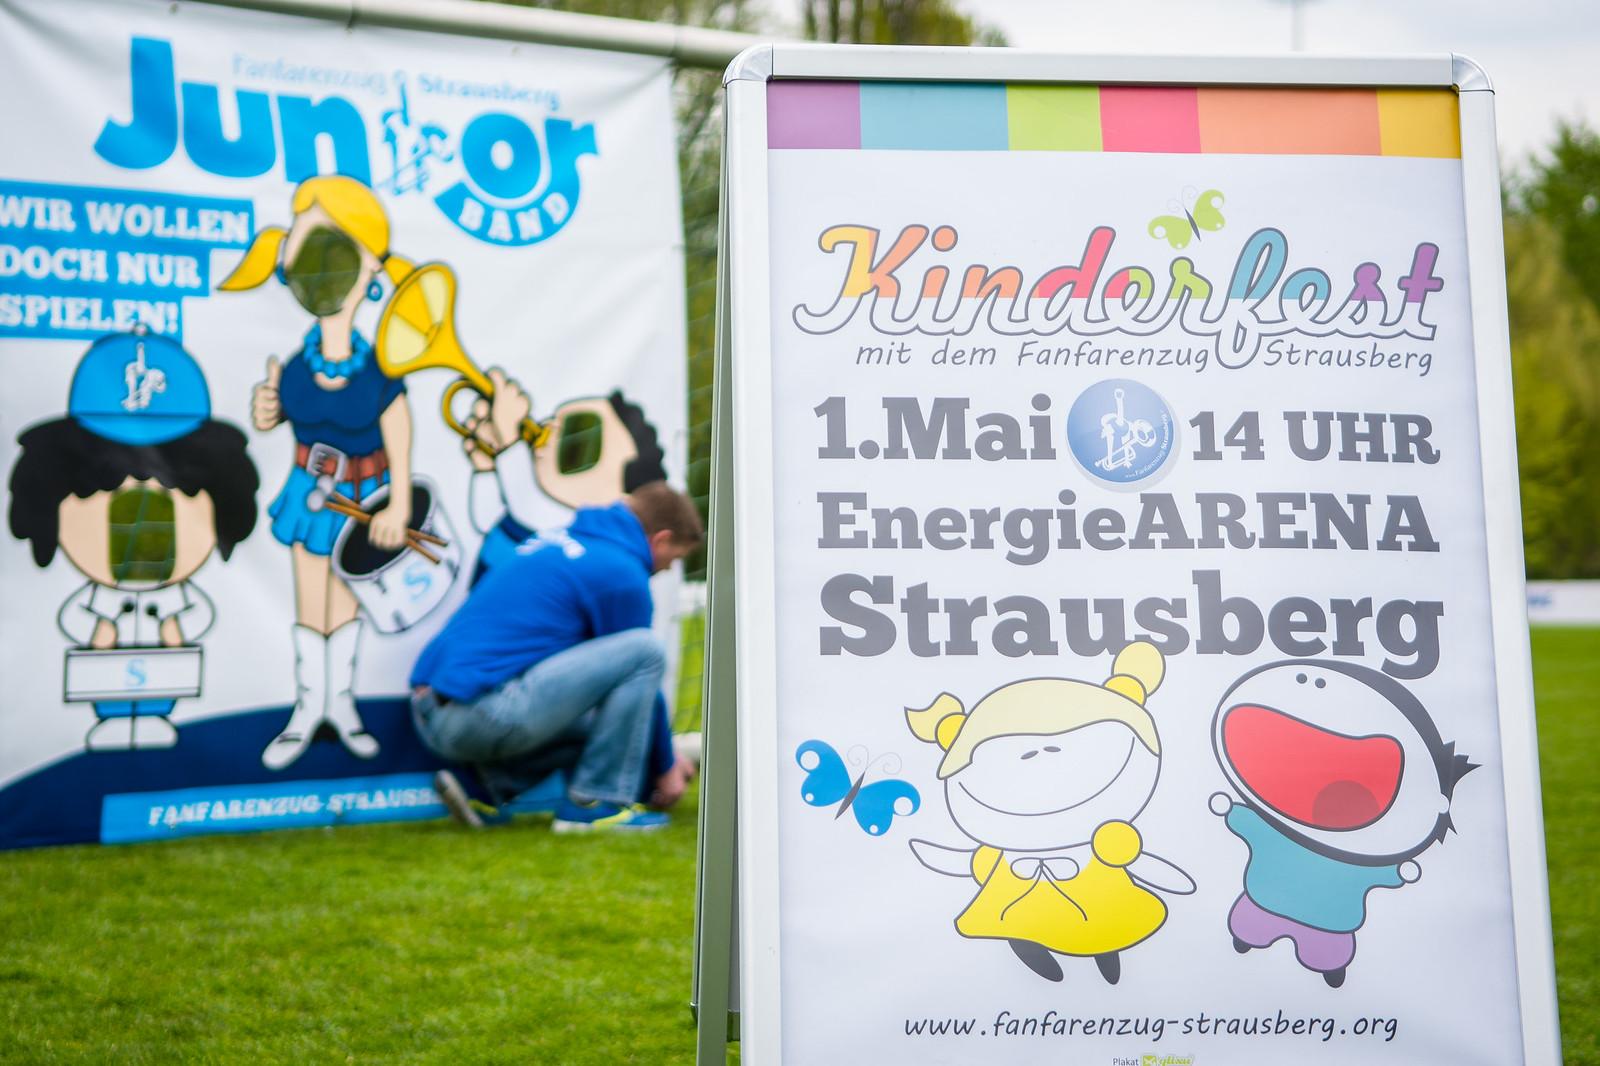 FANFARENZUG-STRAUSBERG-KINDERFEST-FOTO